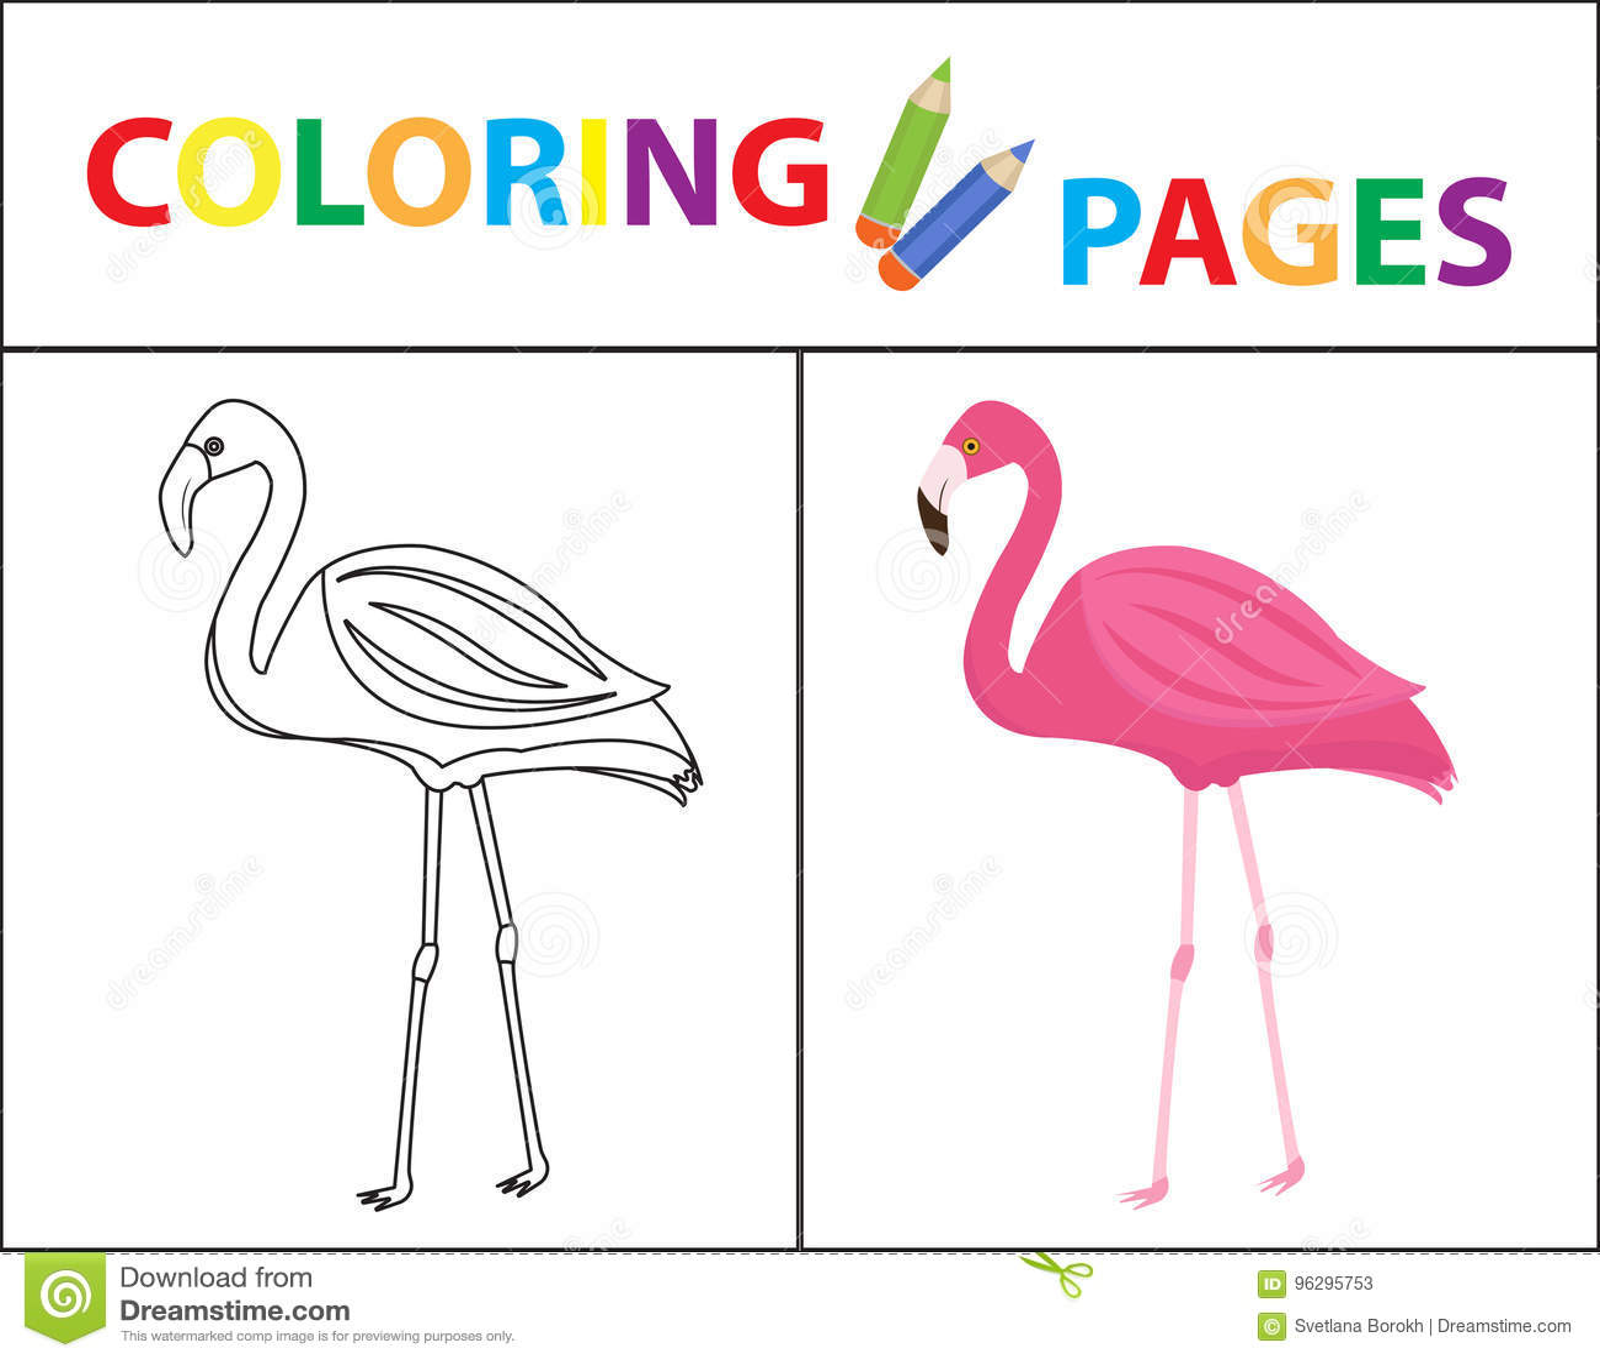 coloring book page flamingo sketch outline color version coloring kids childrens education vector illustration